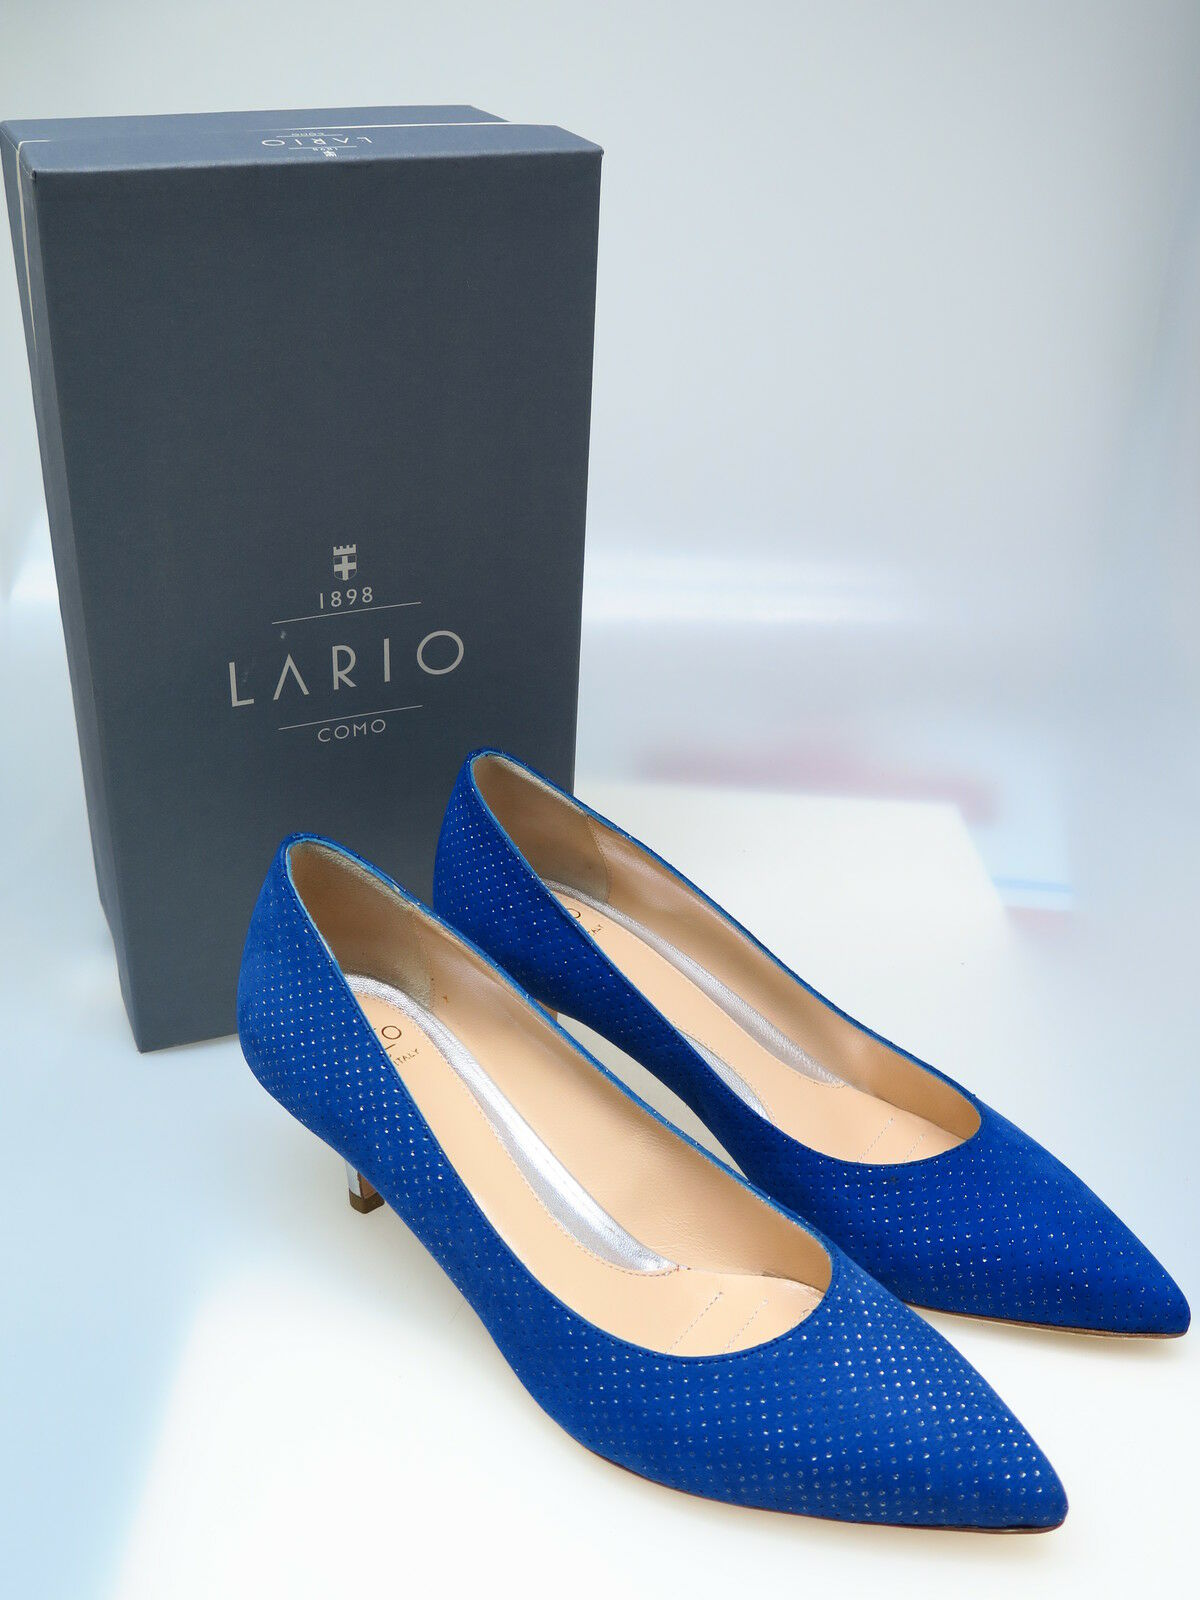 LARIO COMO 1898 Designer Damenschuhe LR1049 Lame Foro Lame LR1049 Blautte Palo Gr. 40,5 NEU 985700